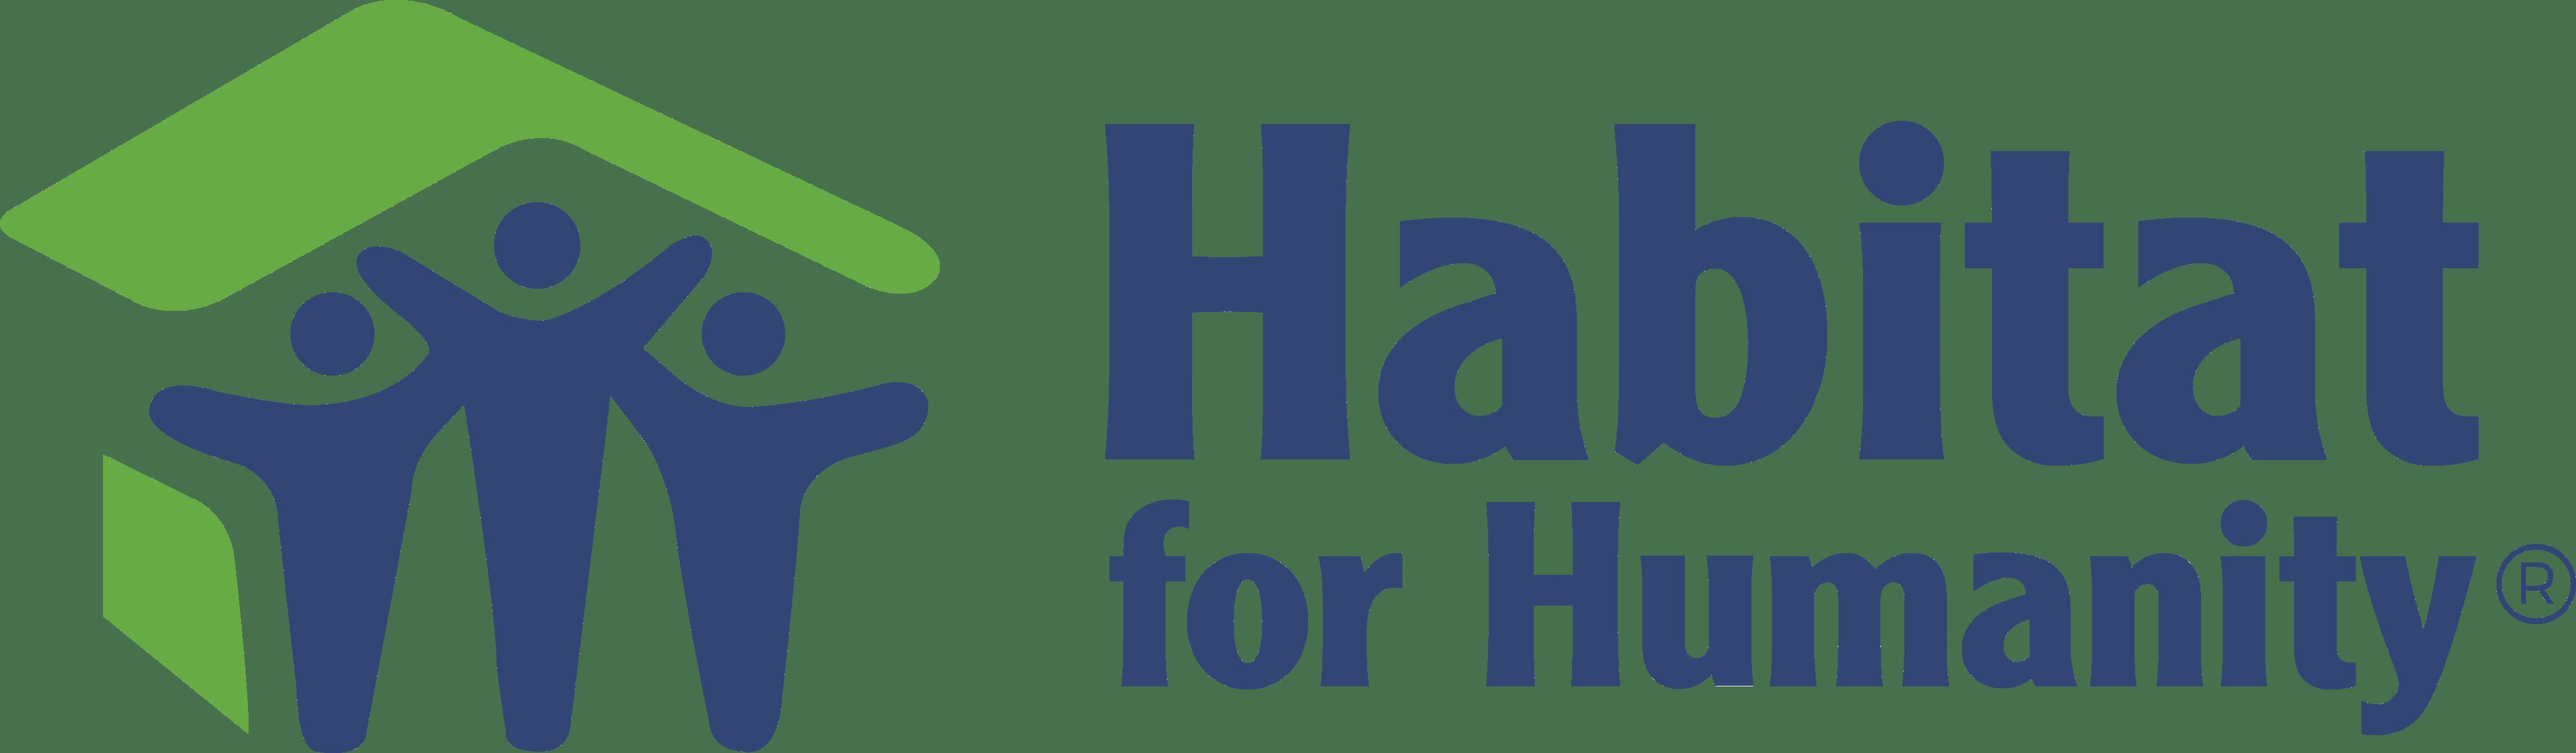 Habitat for humanity logo | McSwain Carpet & Floors